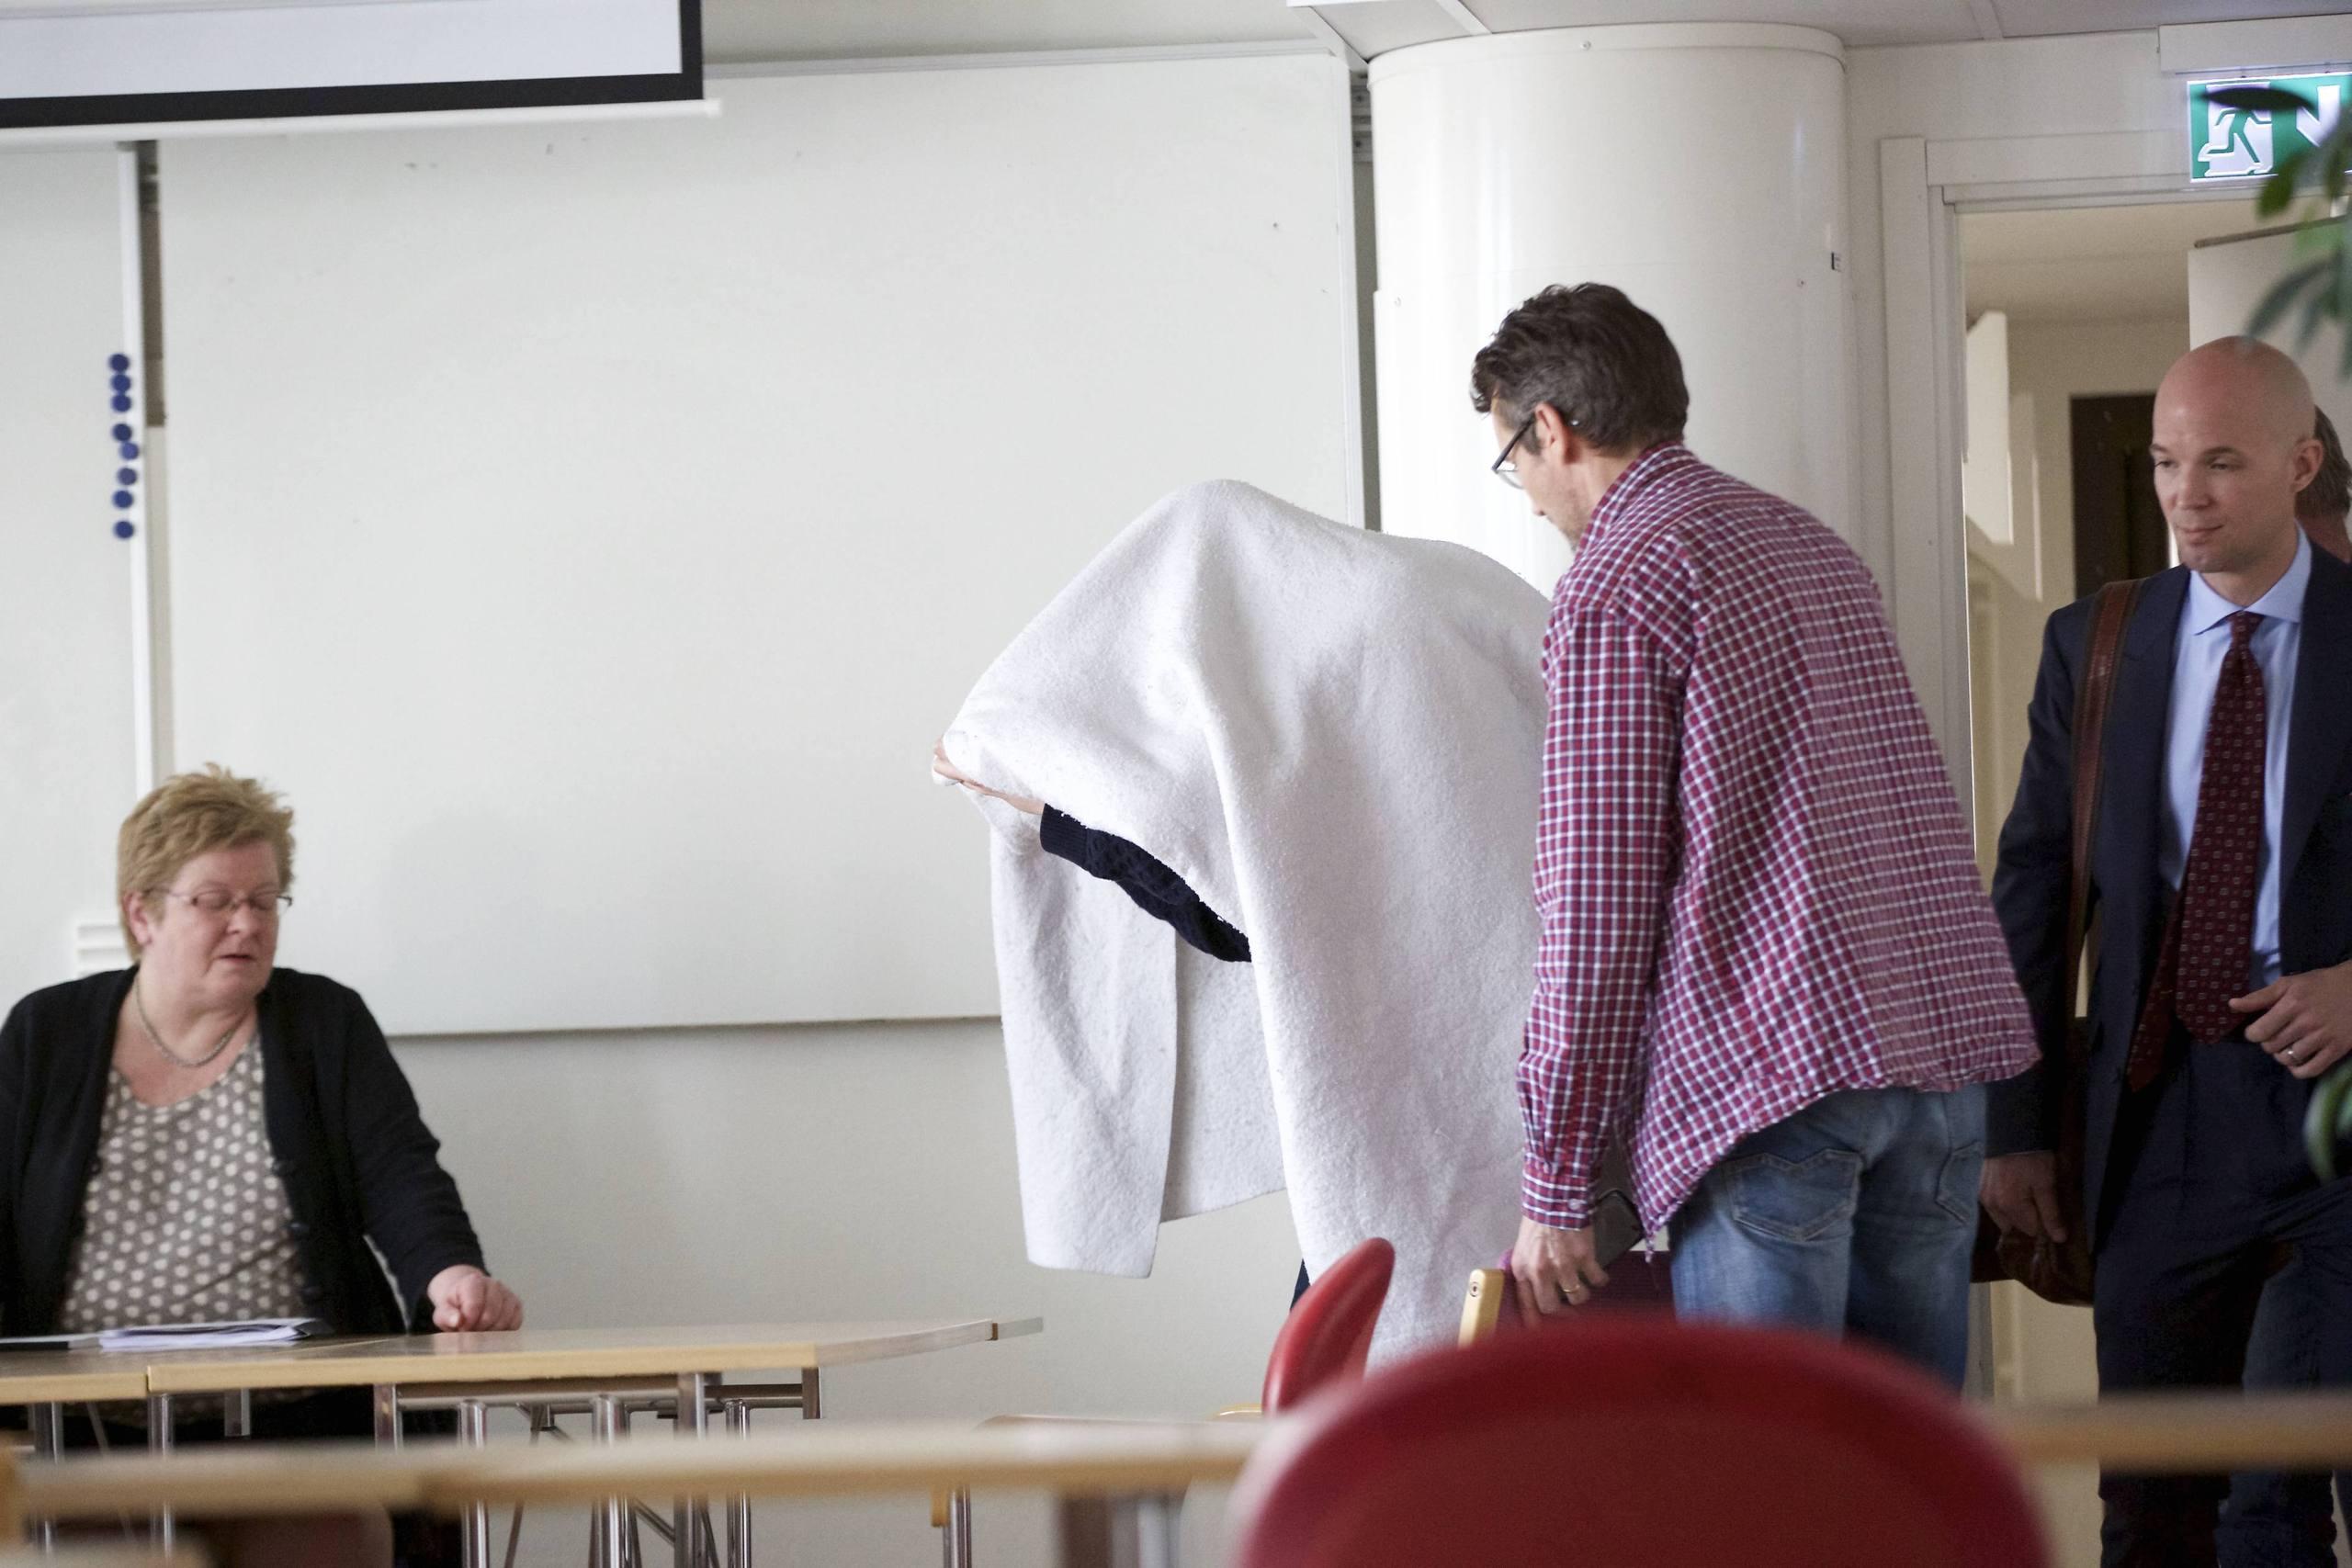 Chefsaklagare domd for sexkop far fortsatta jobba